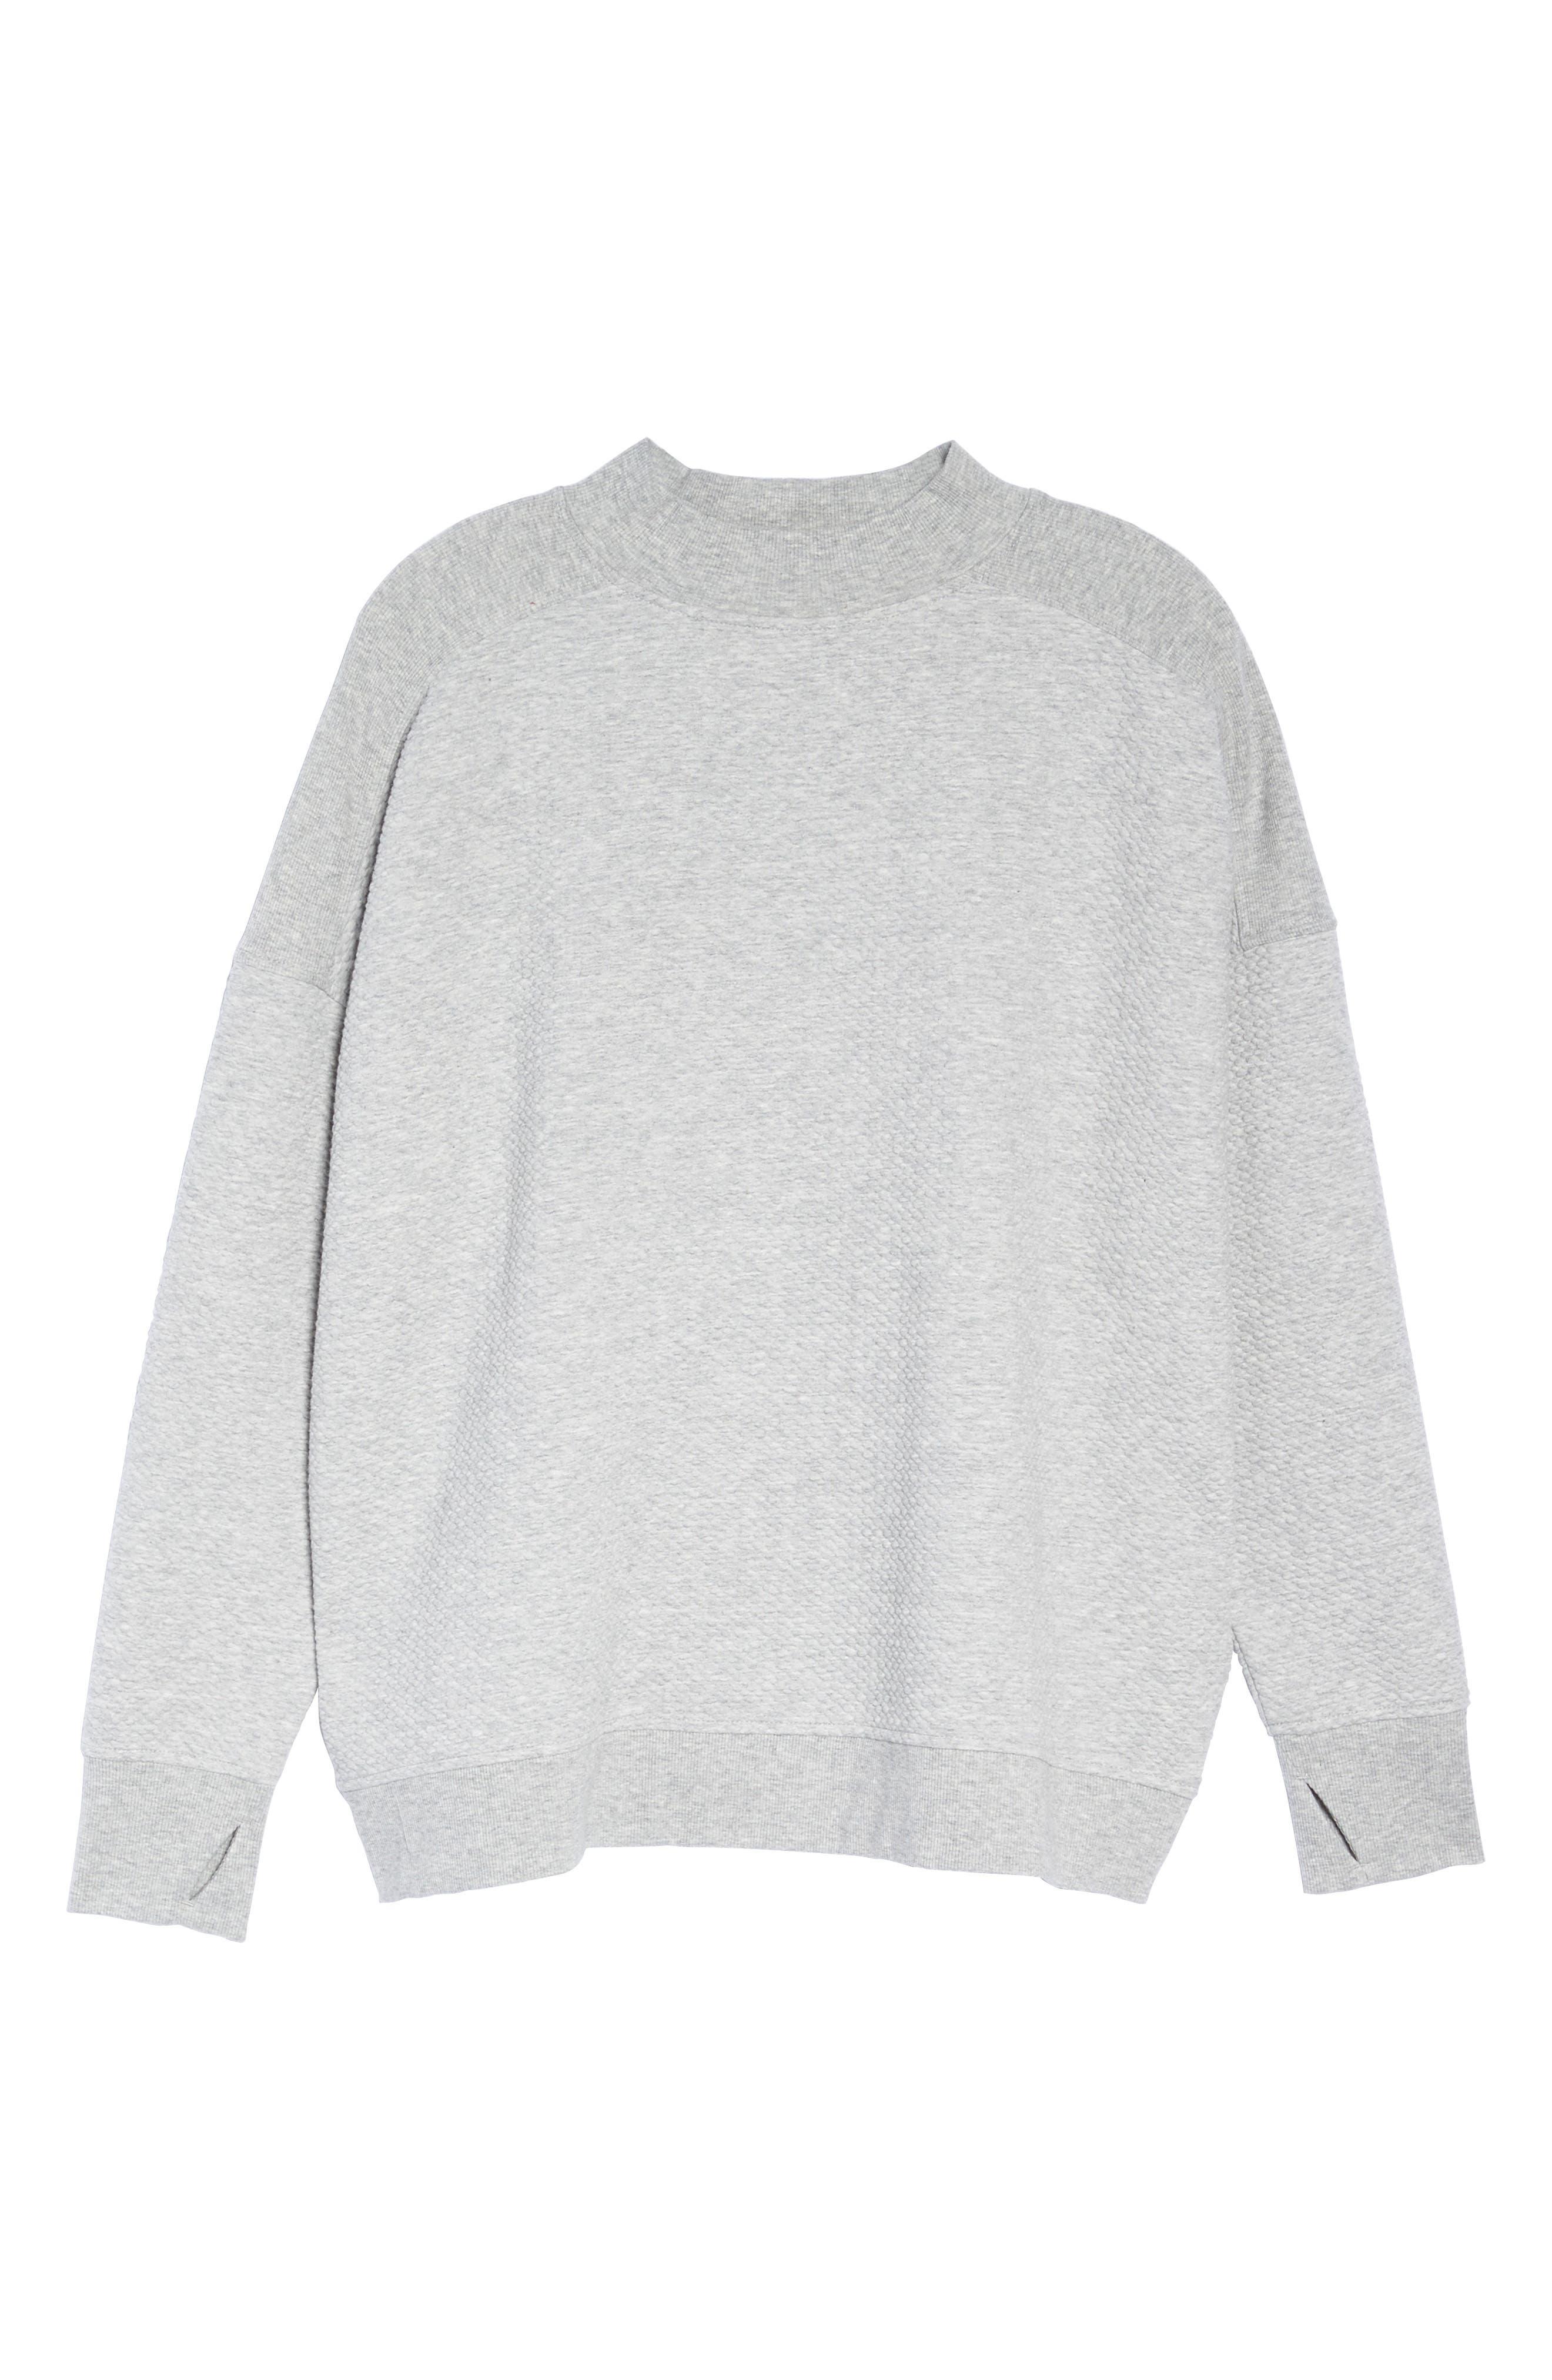 Textured Sweatshirt,                             Alternate thumbnail 6, color,                             050